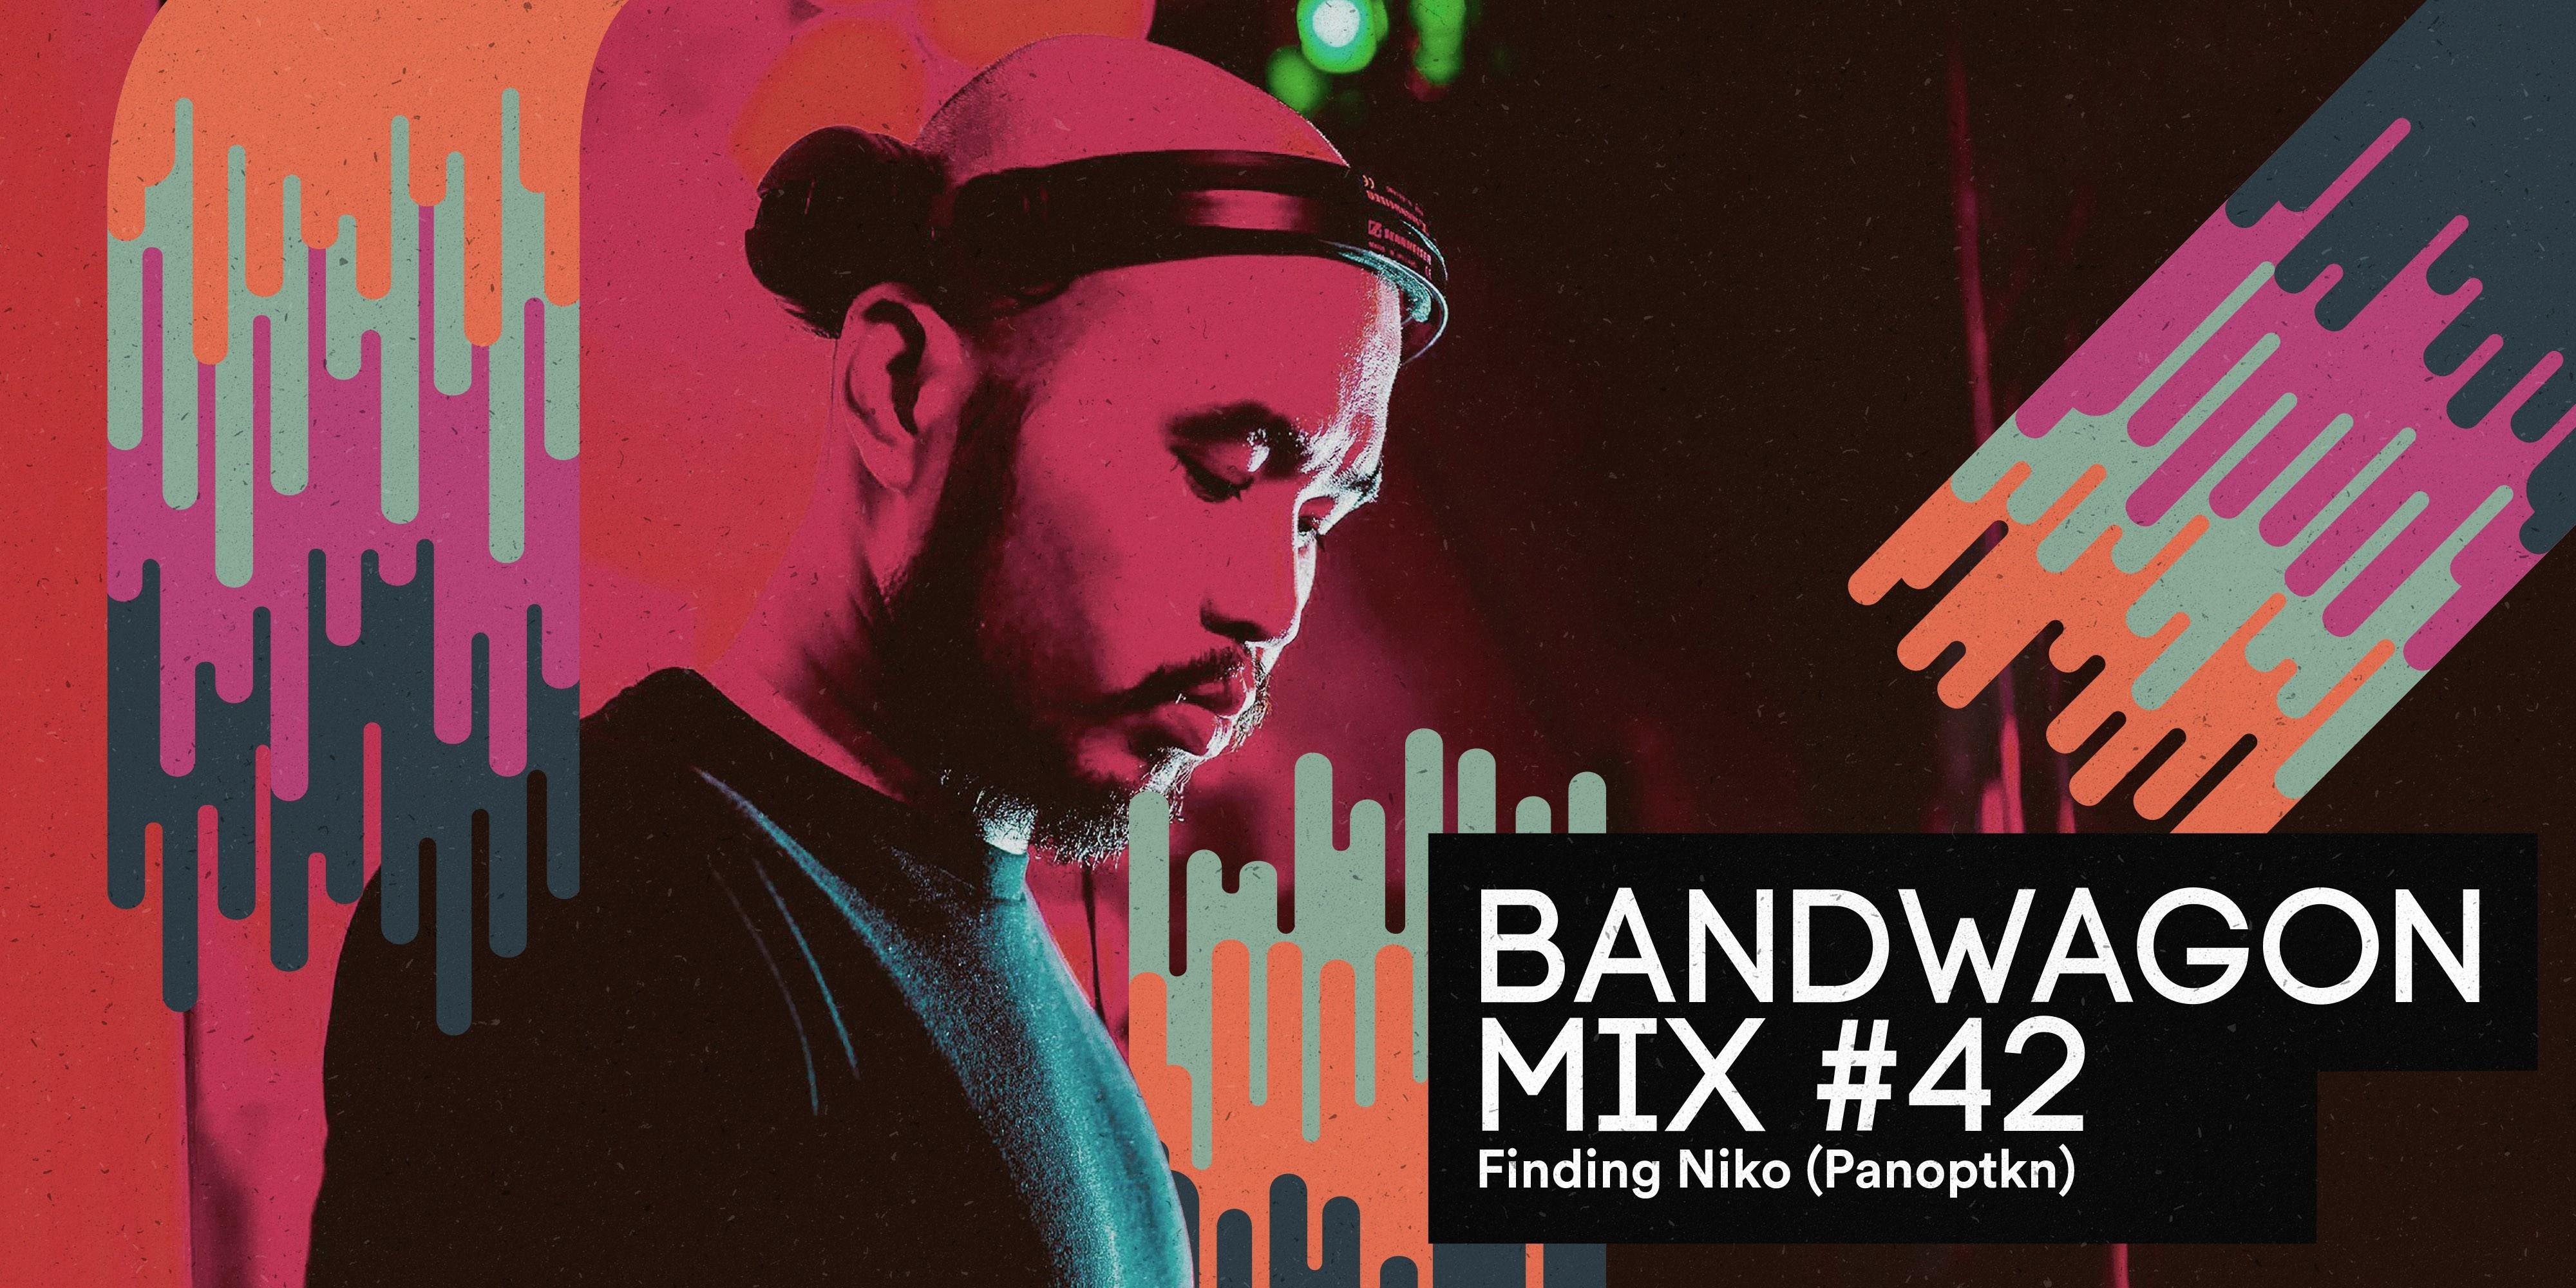 Bandwagon Mix #42: Finding Niko (Panoptkn)